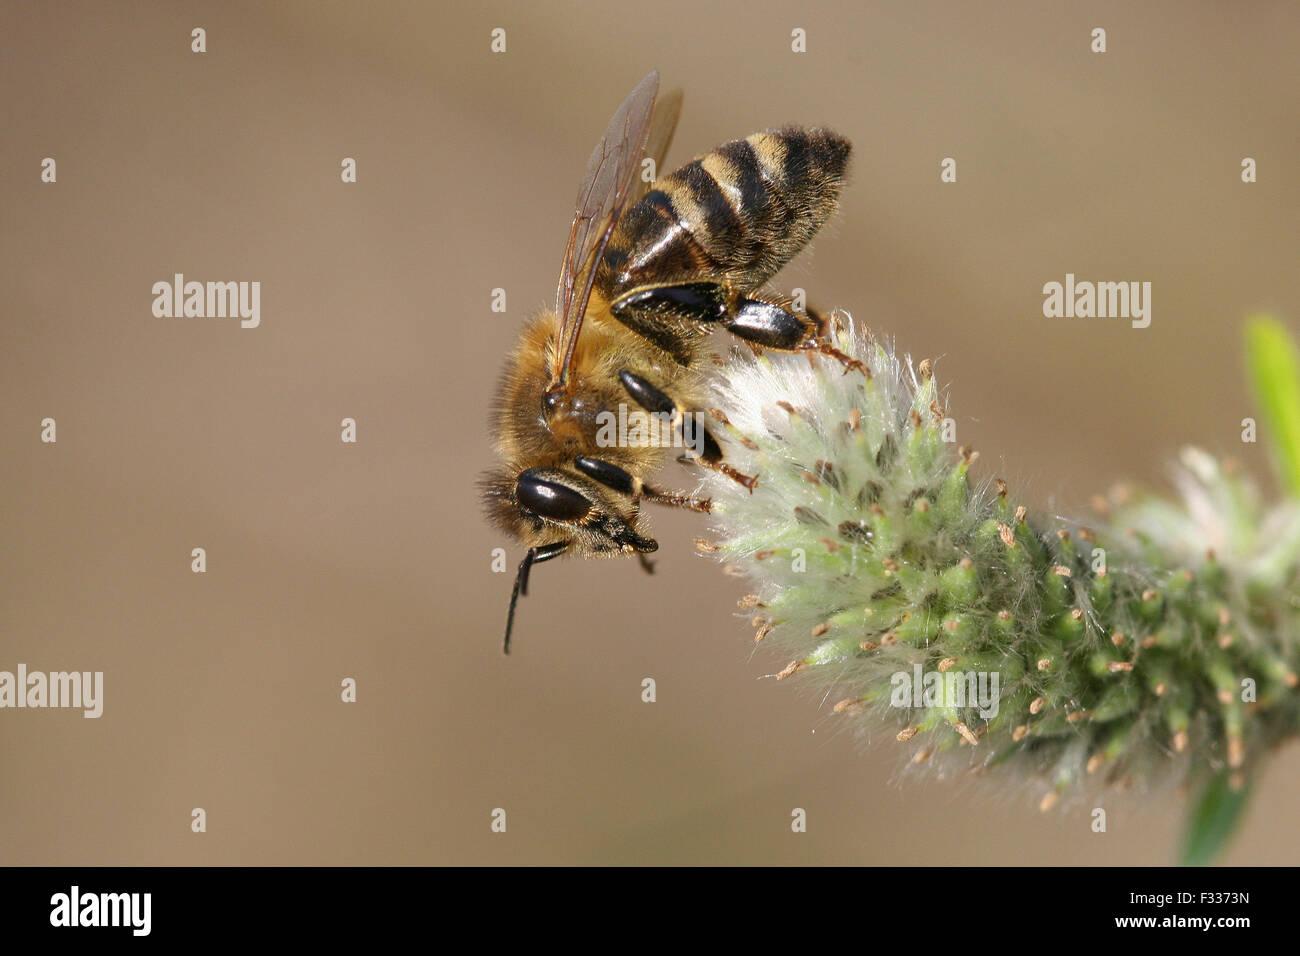 Western honey bee or European honey bee (Apis mellifera) on a goat willow flower (Salix caprea), Thuringia, Germany Stock Photo